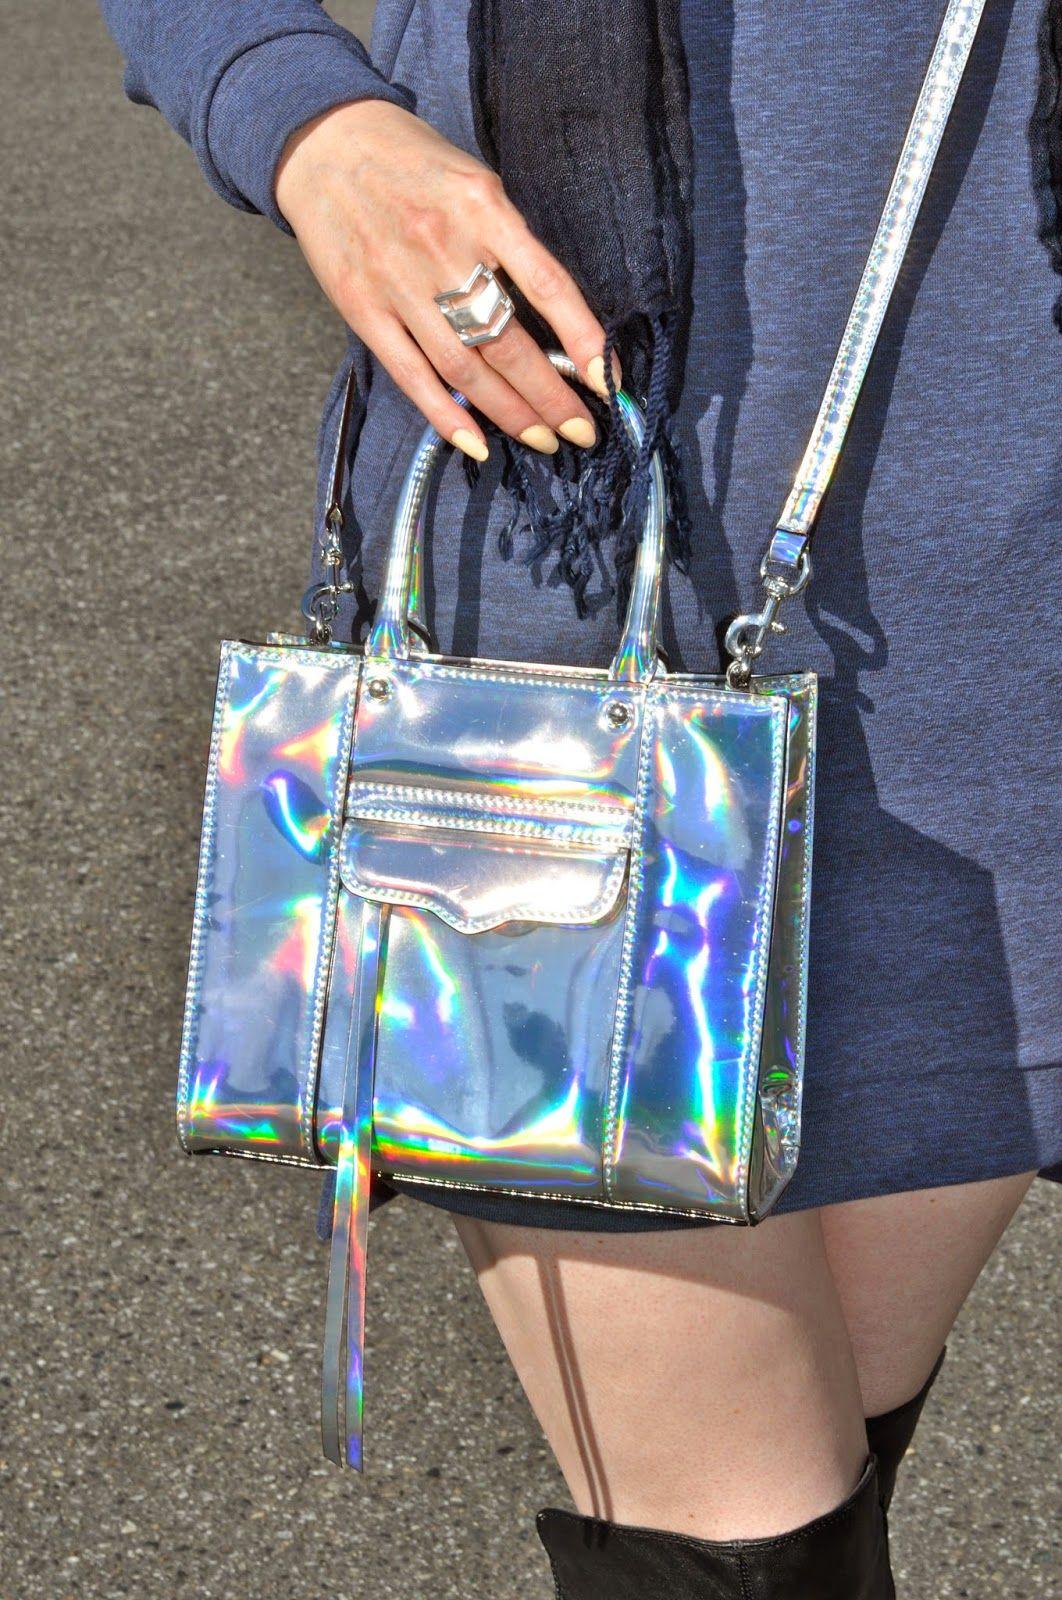 Kiki Simone Fashion - Fashion blog by Kiki Simone Williamson: clothing: SWEATSHIRT DRESS AND THIGH HIGH BOOTS